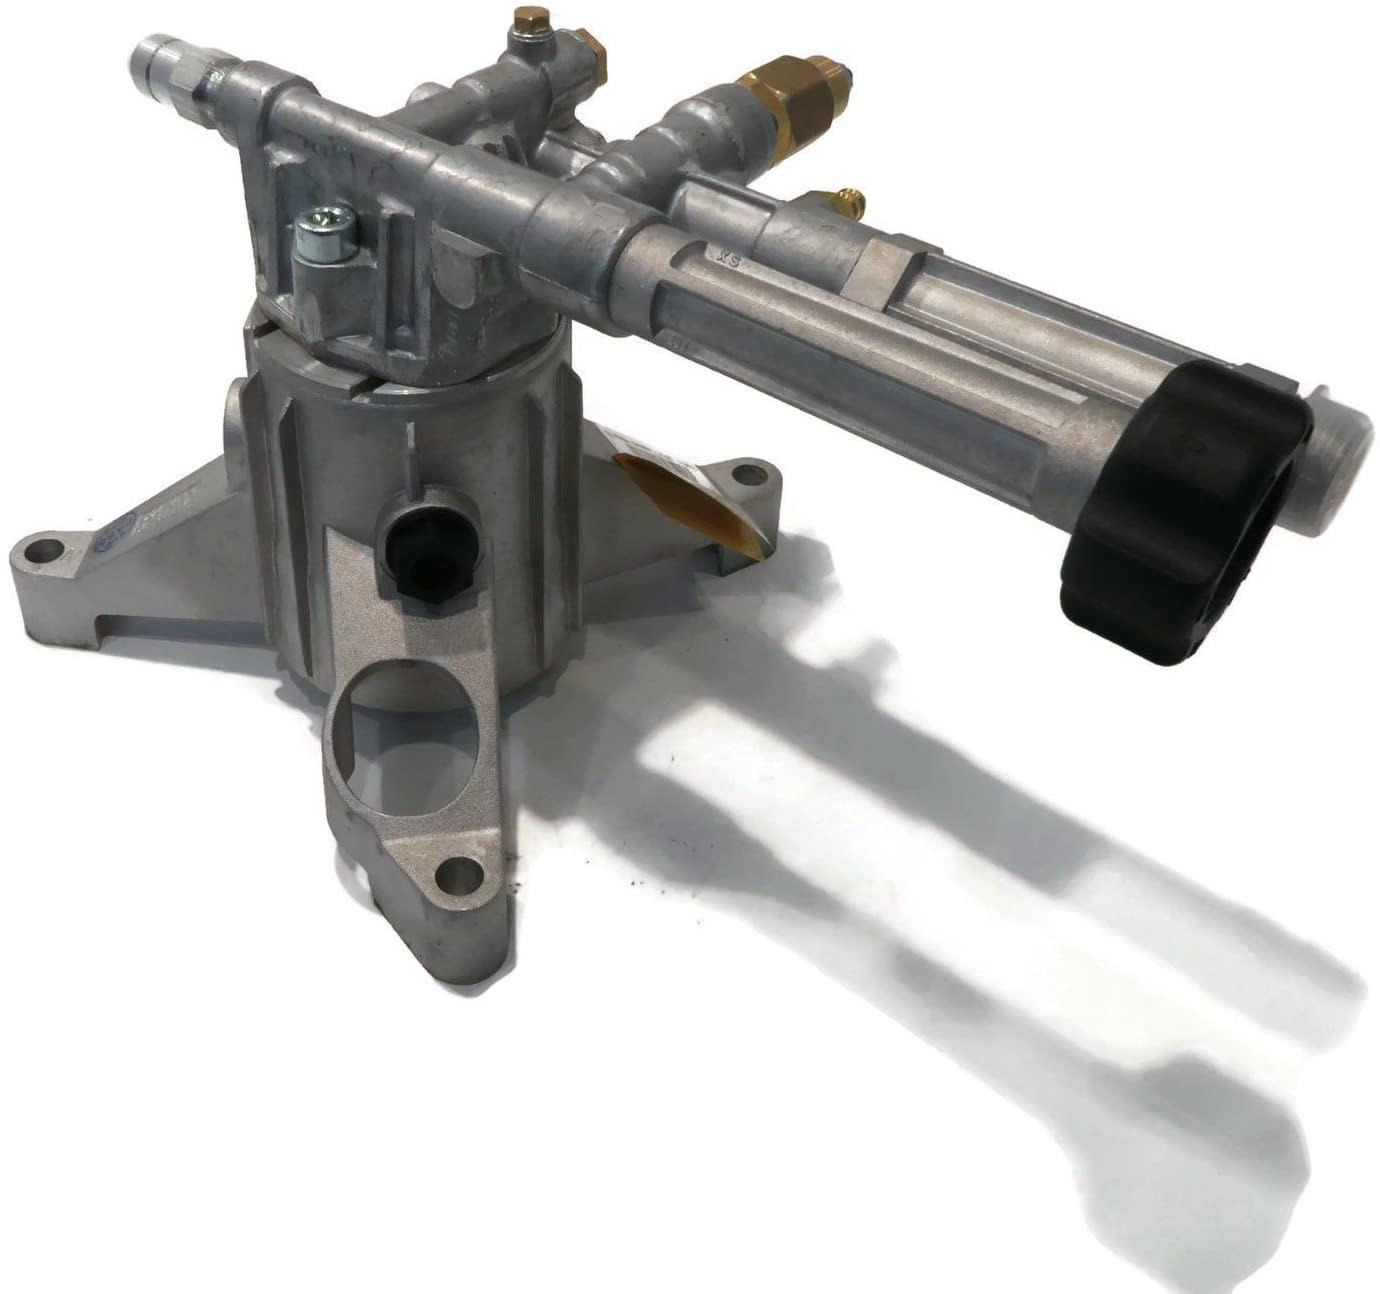 Annovi Reververi OEM AR 2600 psi Power Pressure Washer Water Pump - fits Many Makes & Models